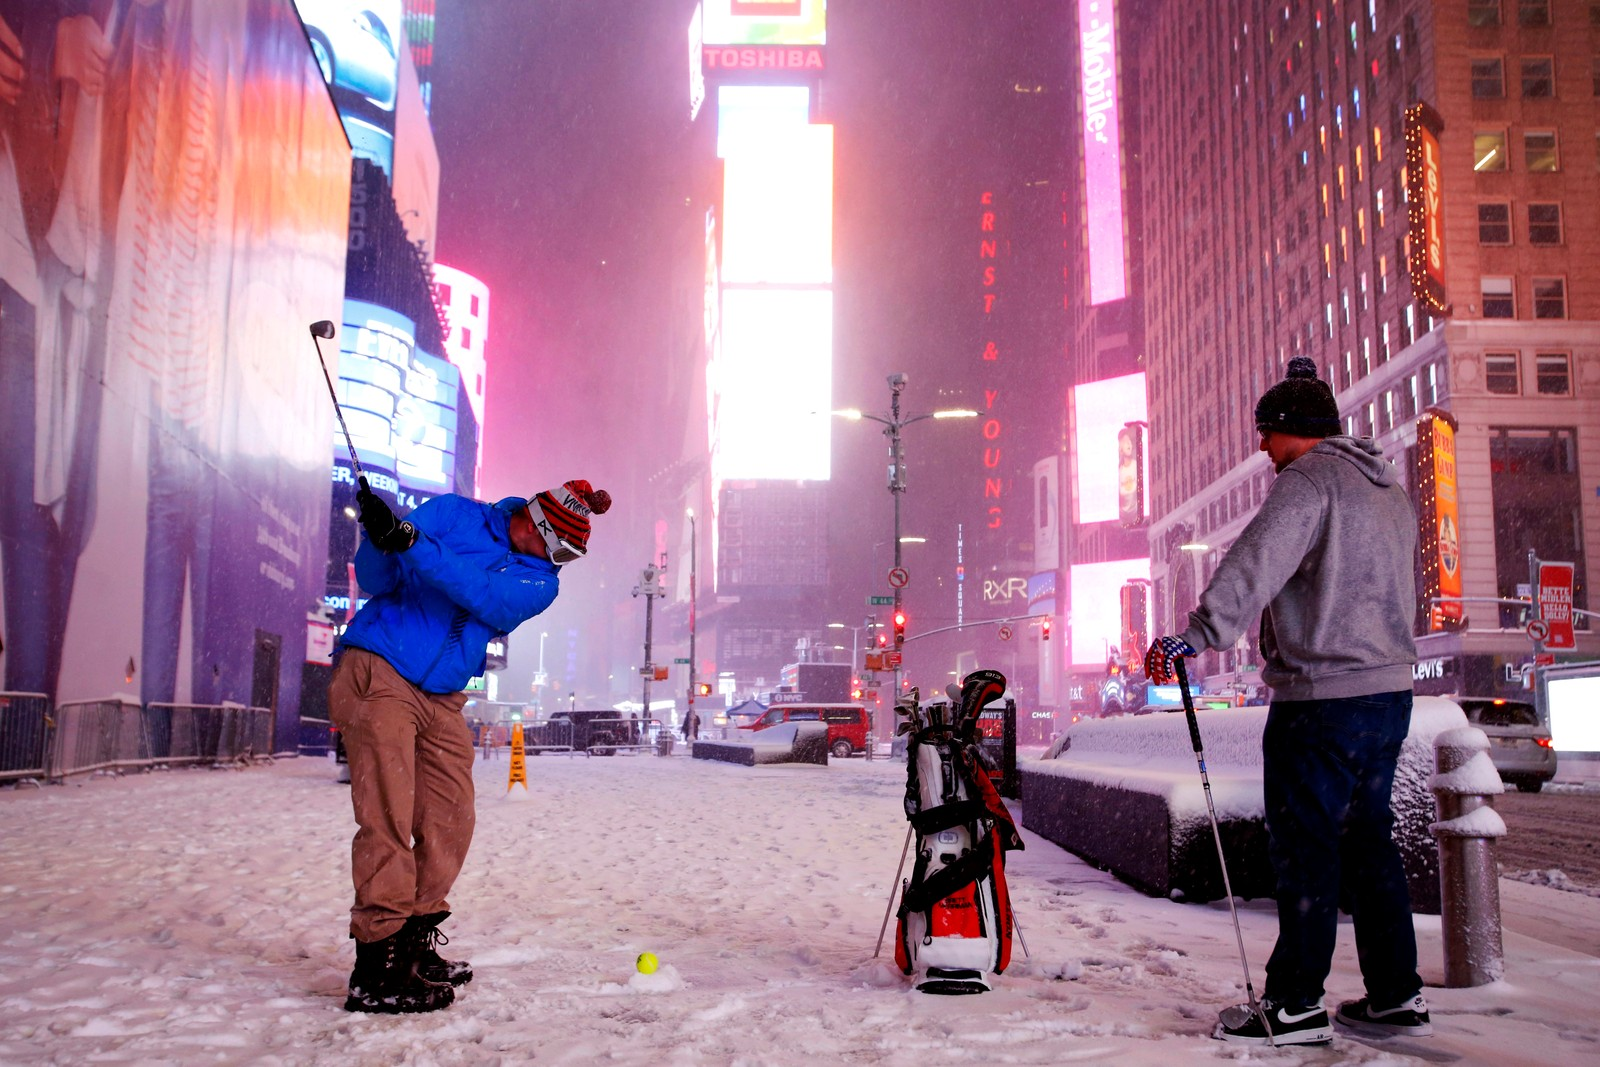 Det finnes ikke dårlig vær... To menn spiller golf under snøværet på Times Square i New York.